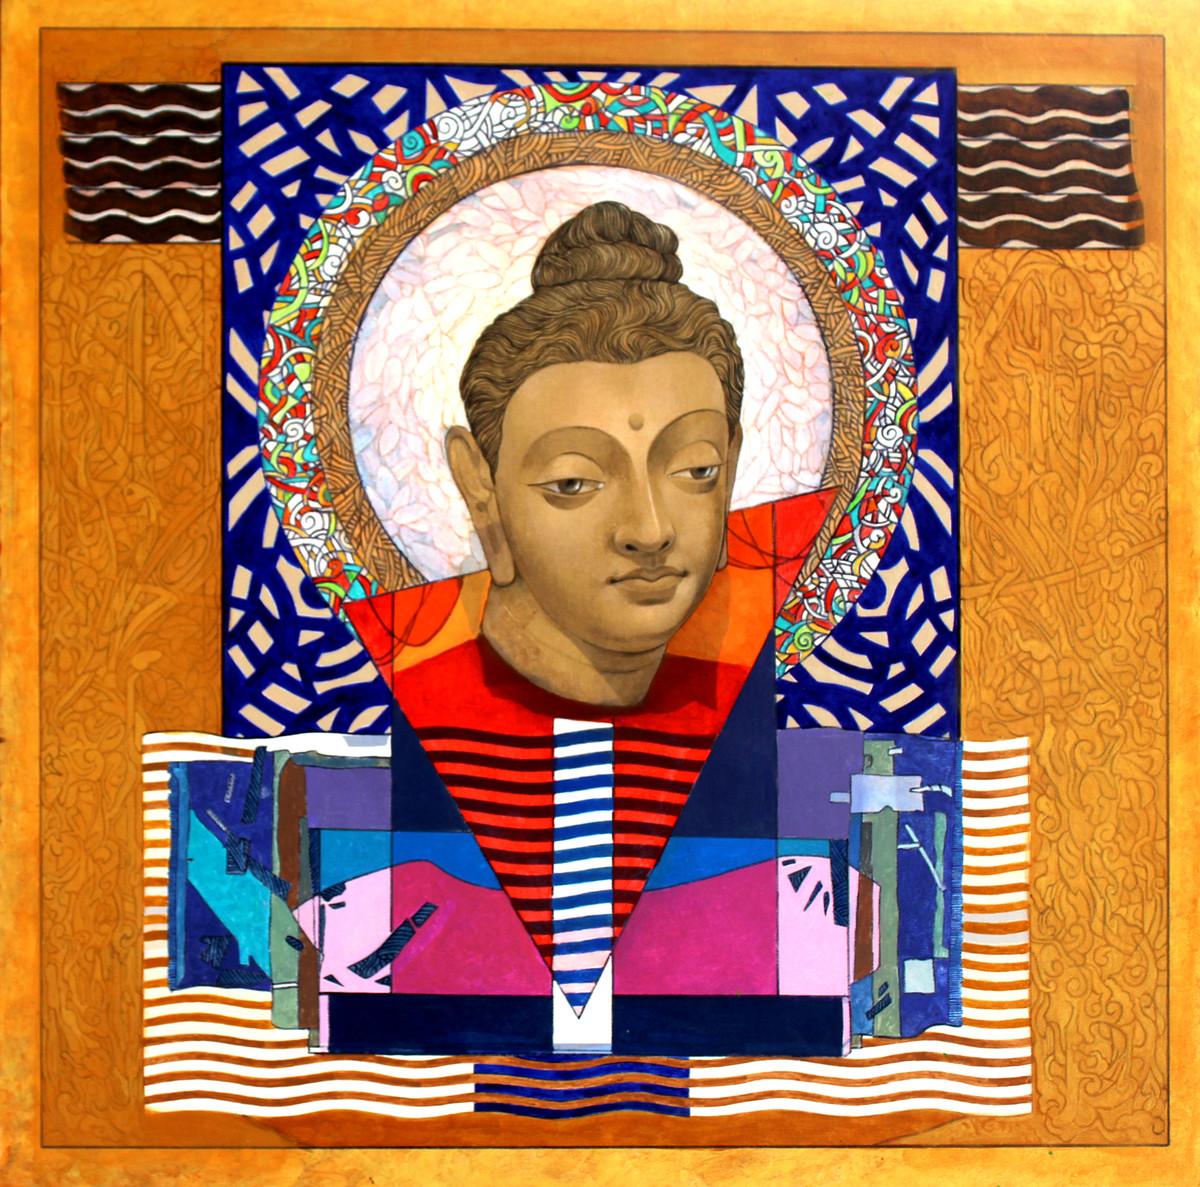 Enlightened Buddha 3 Digital Print by Deepankar Majumdar,Expressionism